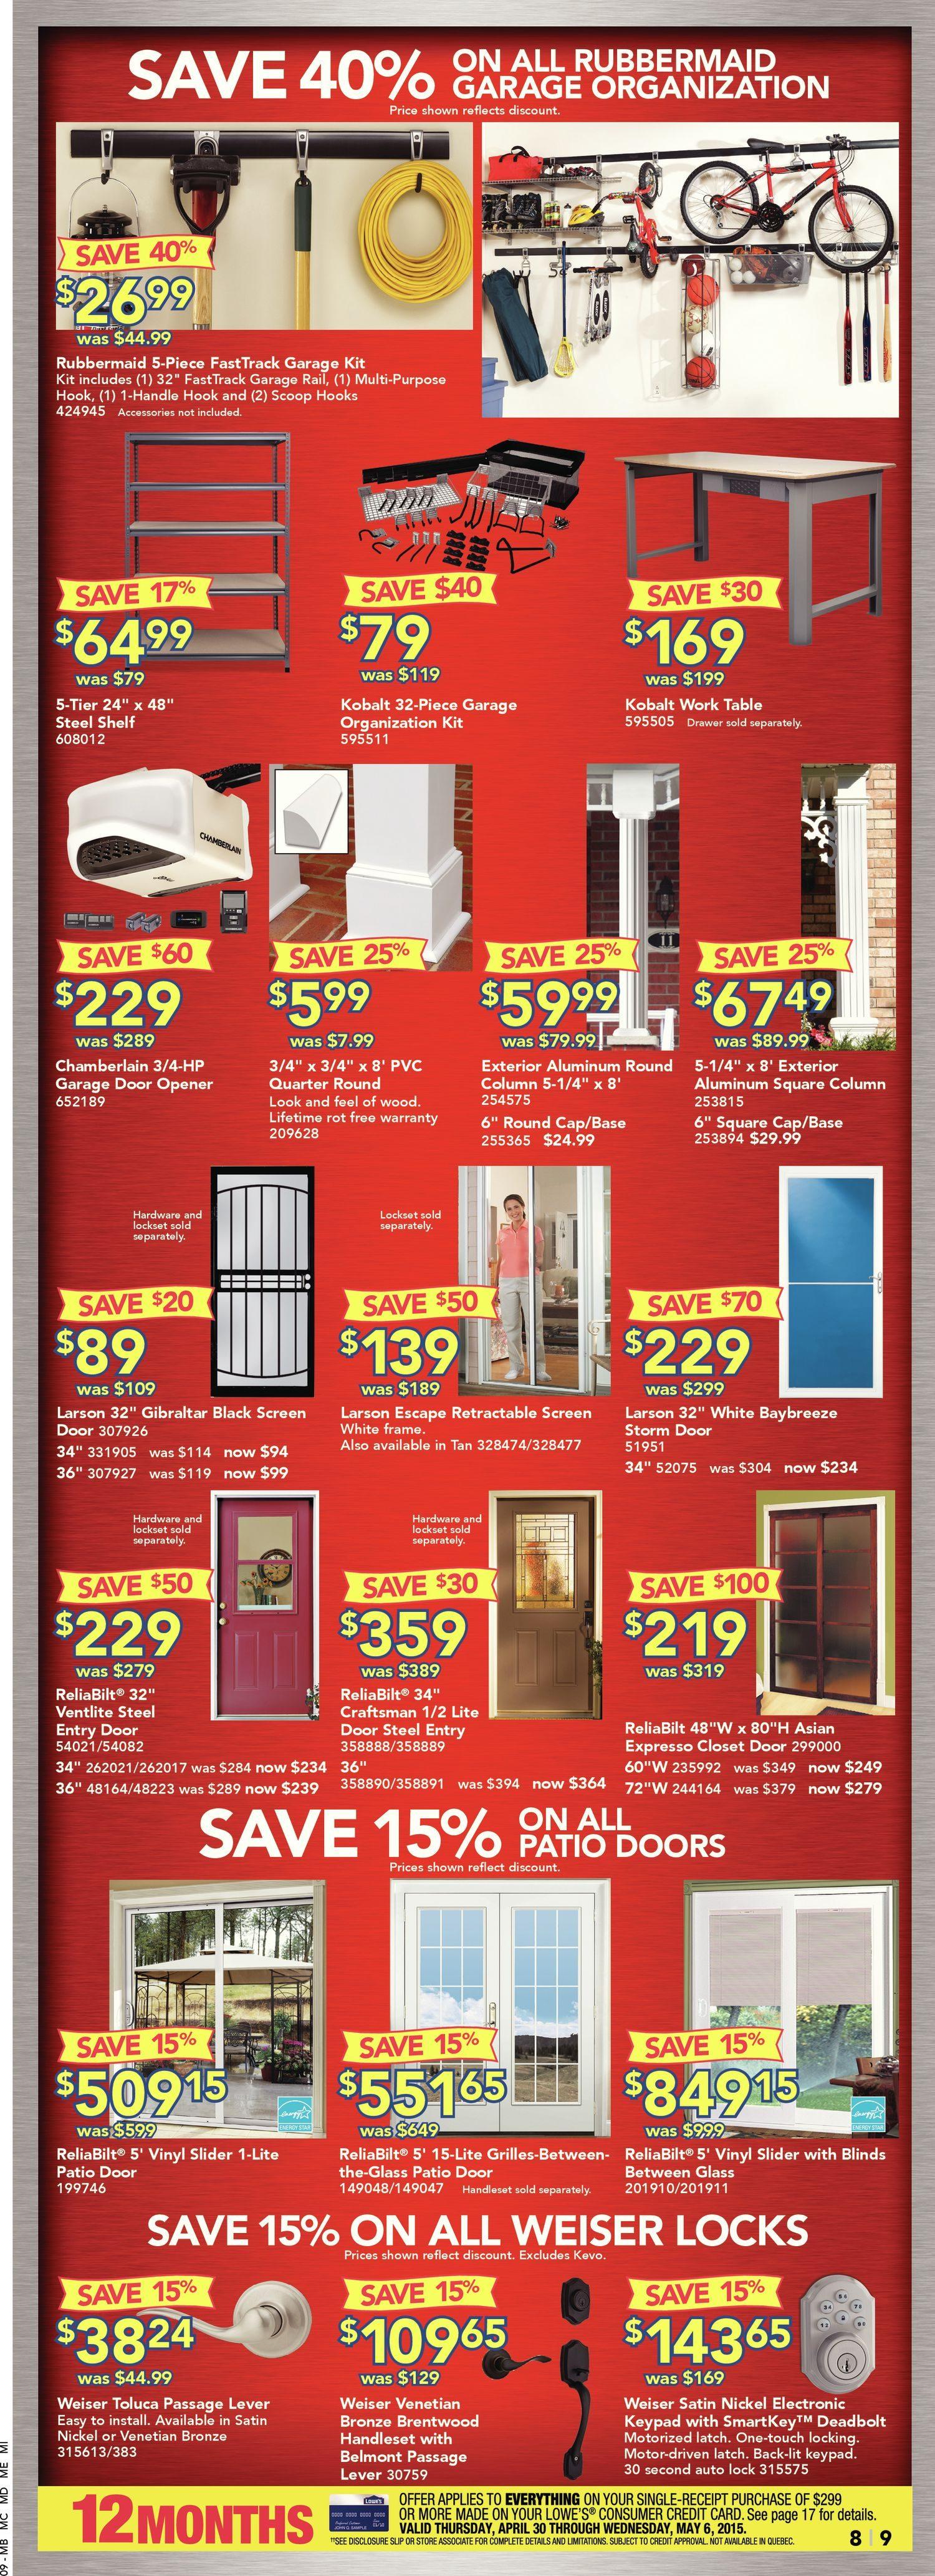 Lowe s Weekly Flyer Weekly Anniversary Sale Apr 30 – May 6